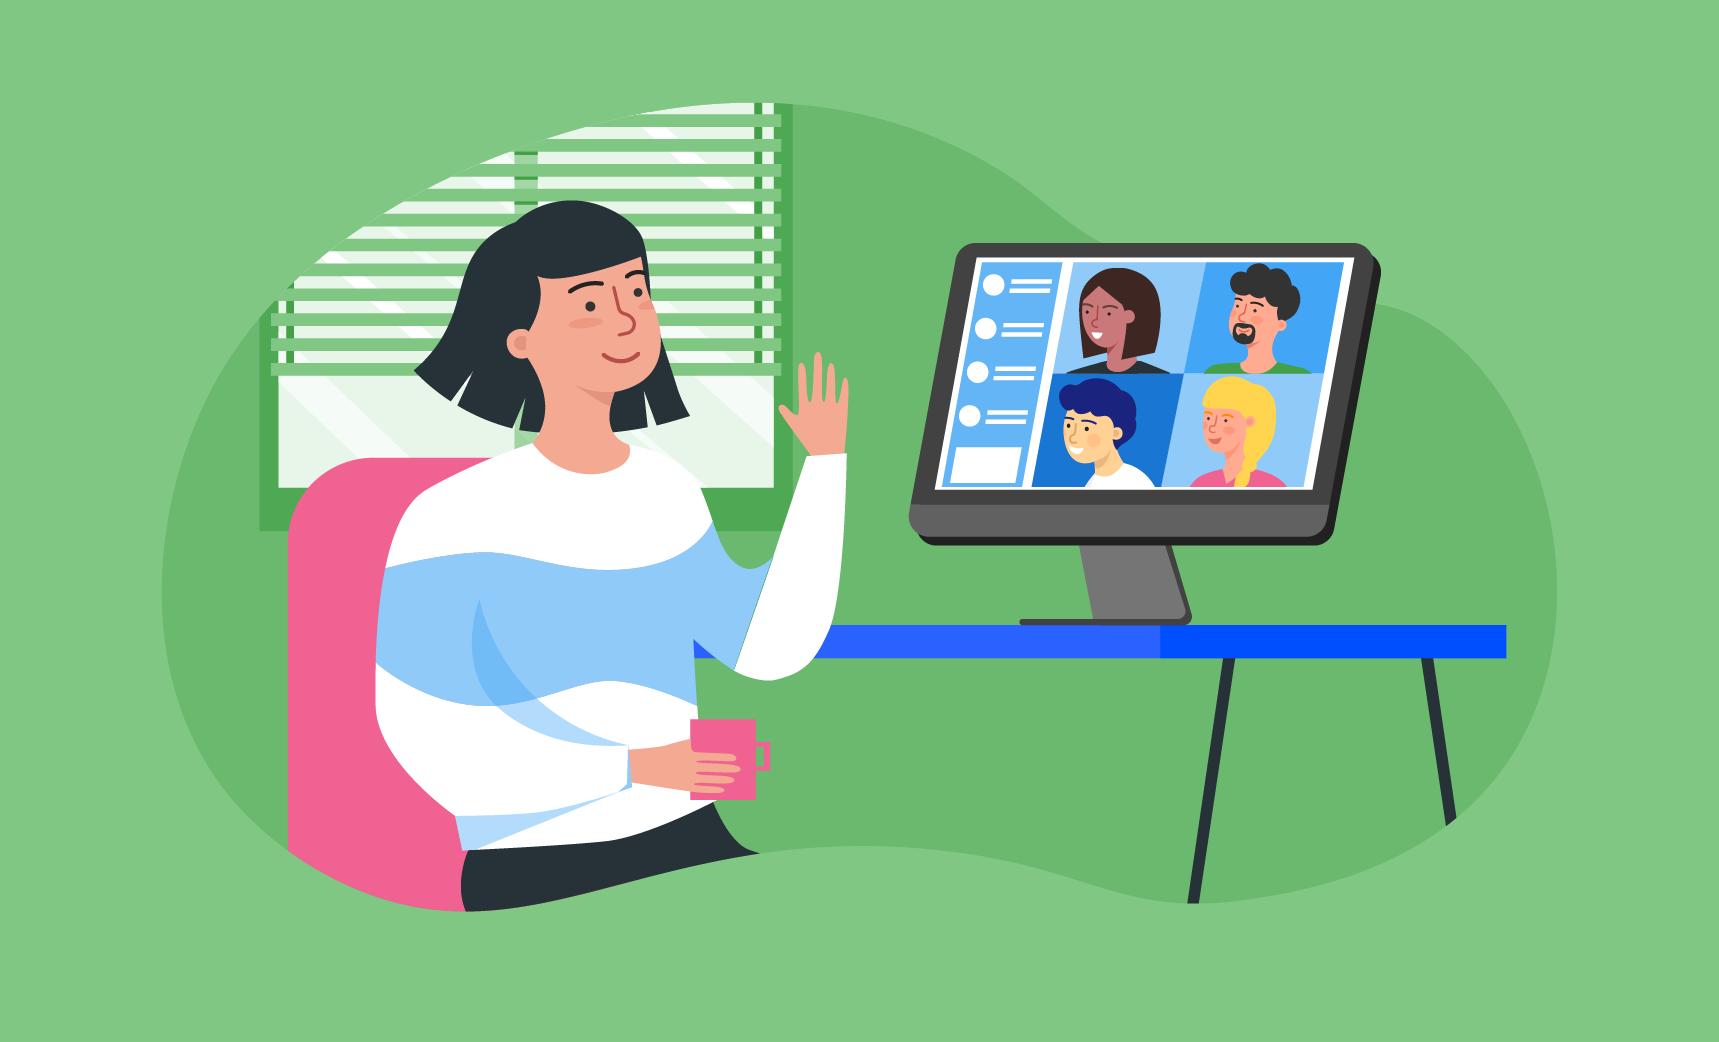 7 ways to improve remote communication